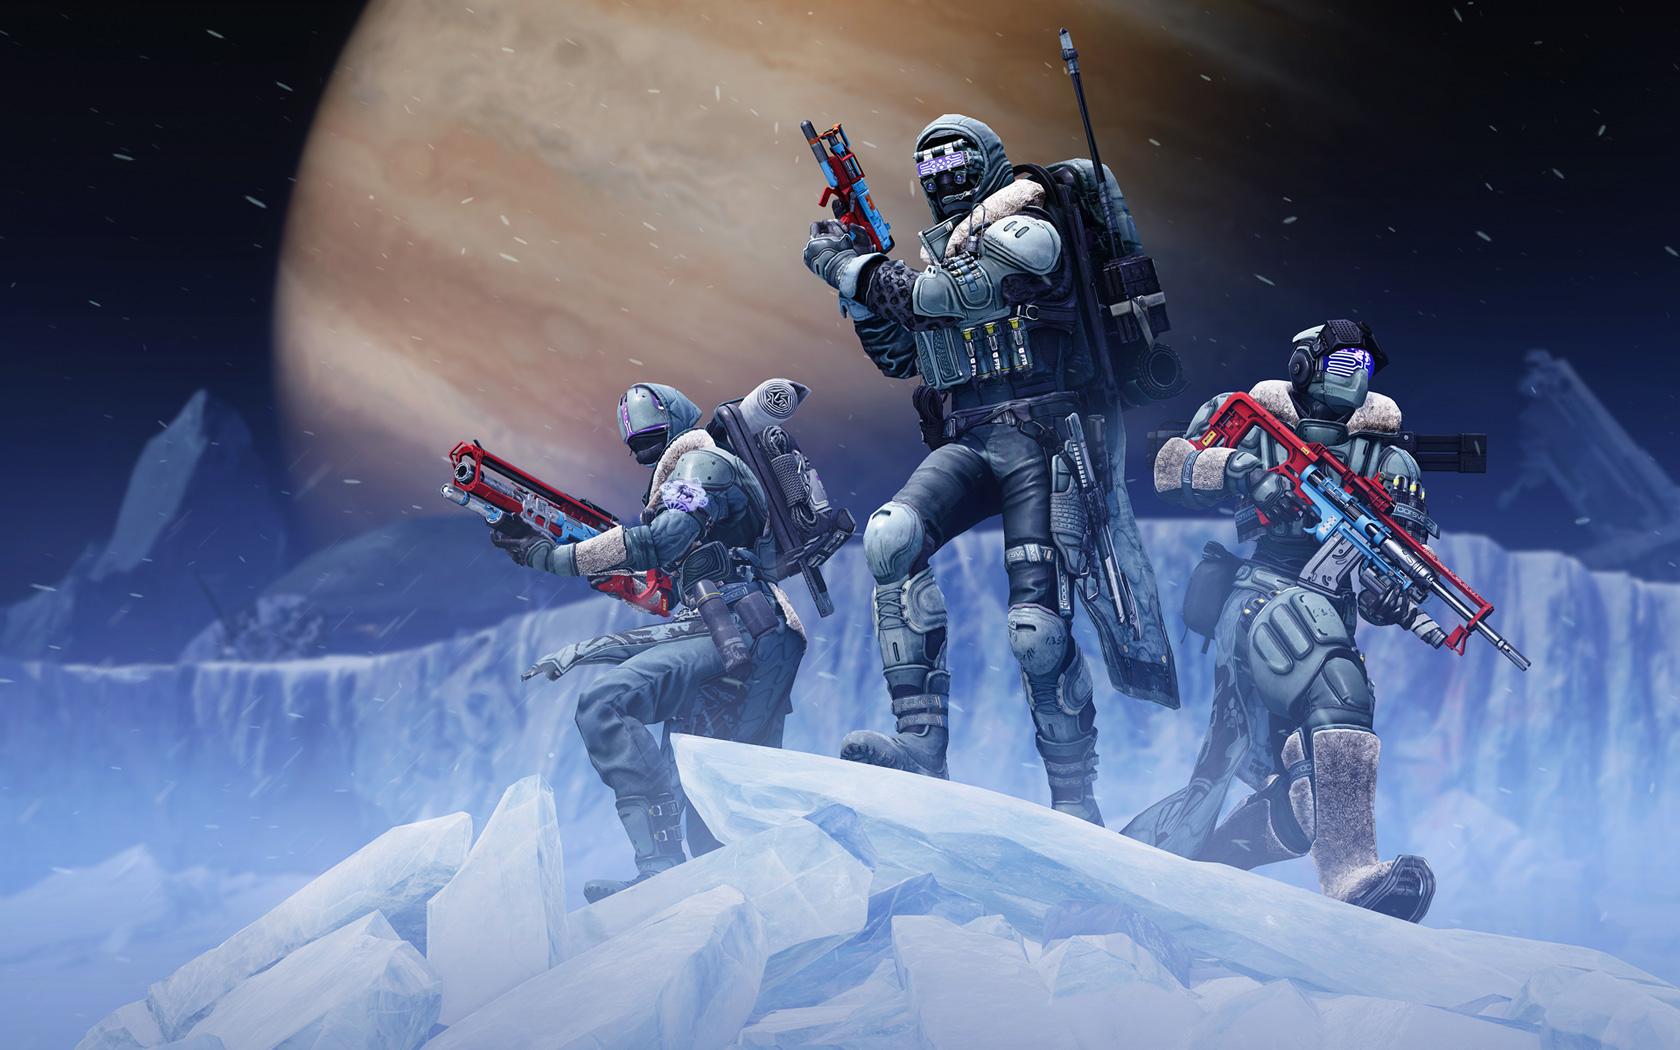 Free Destiny 2 Wallpaper in 1680x1050